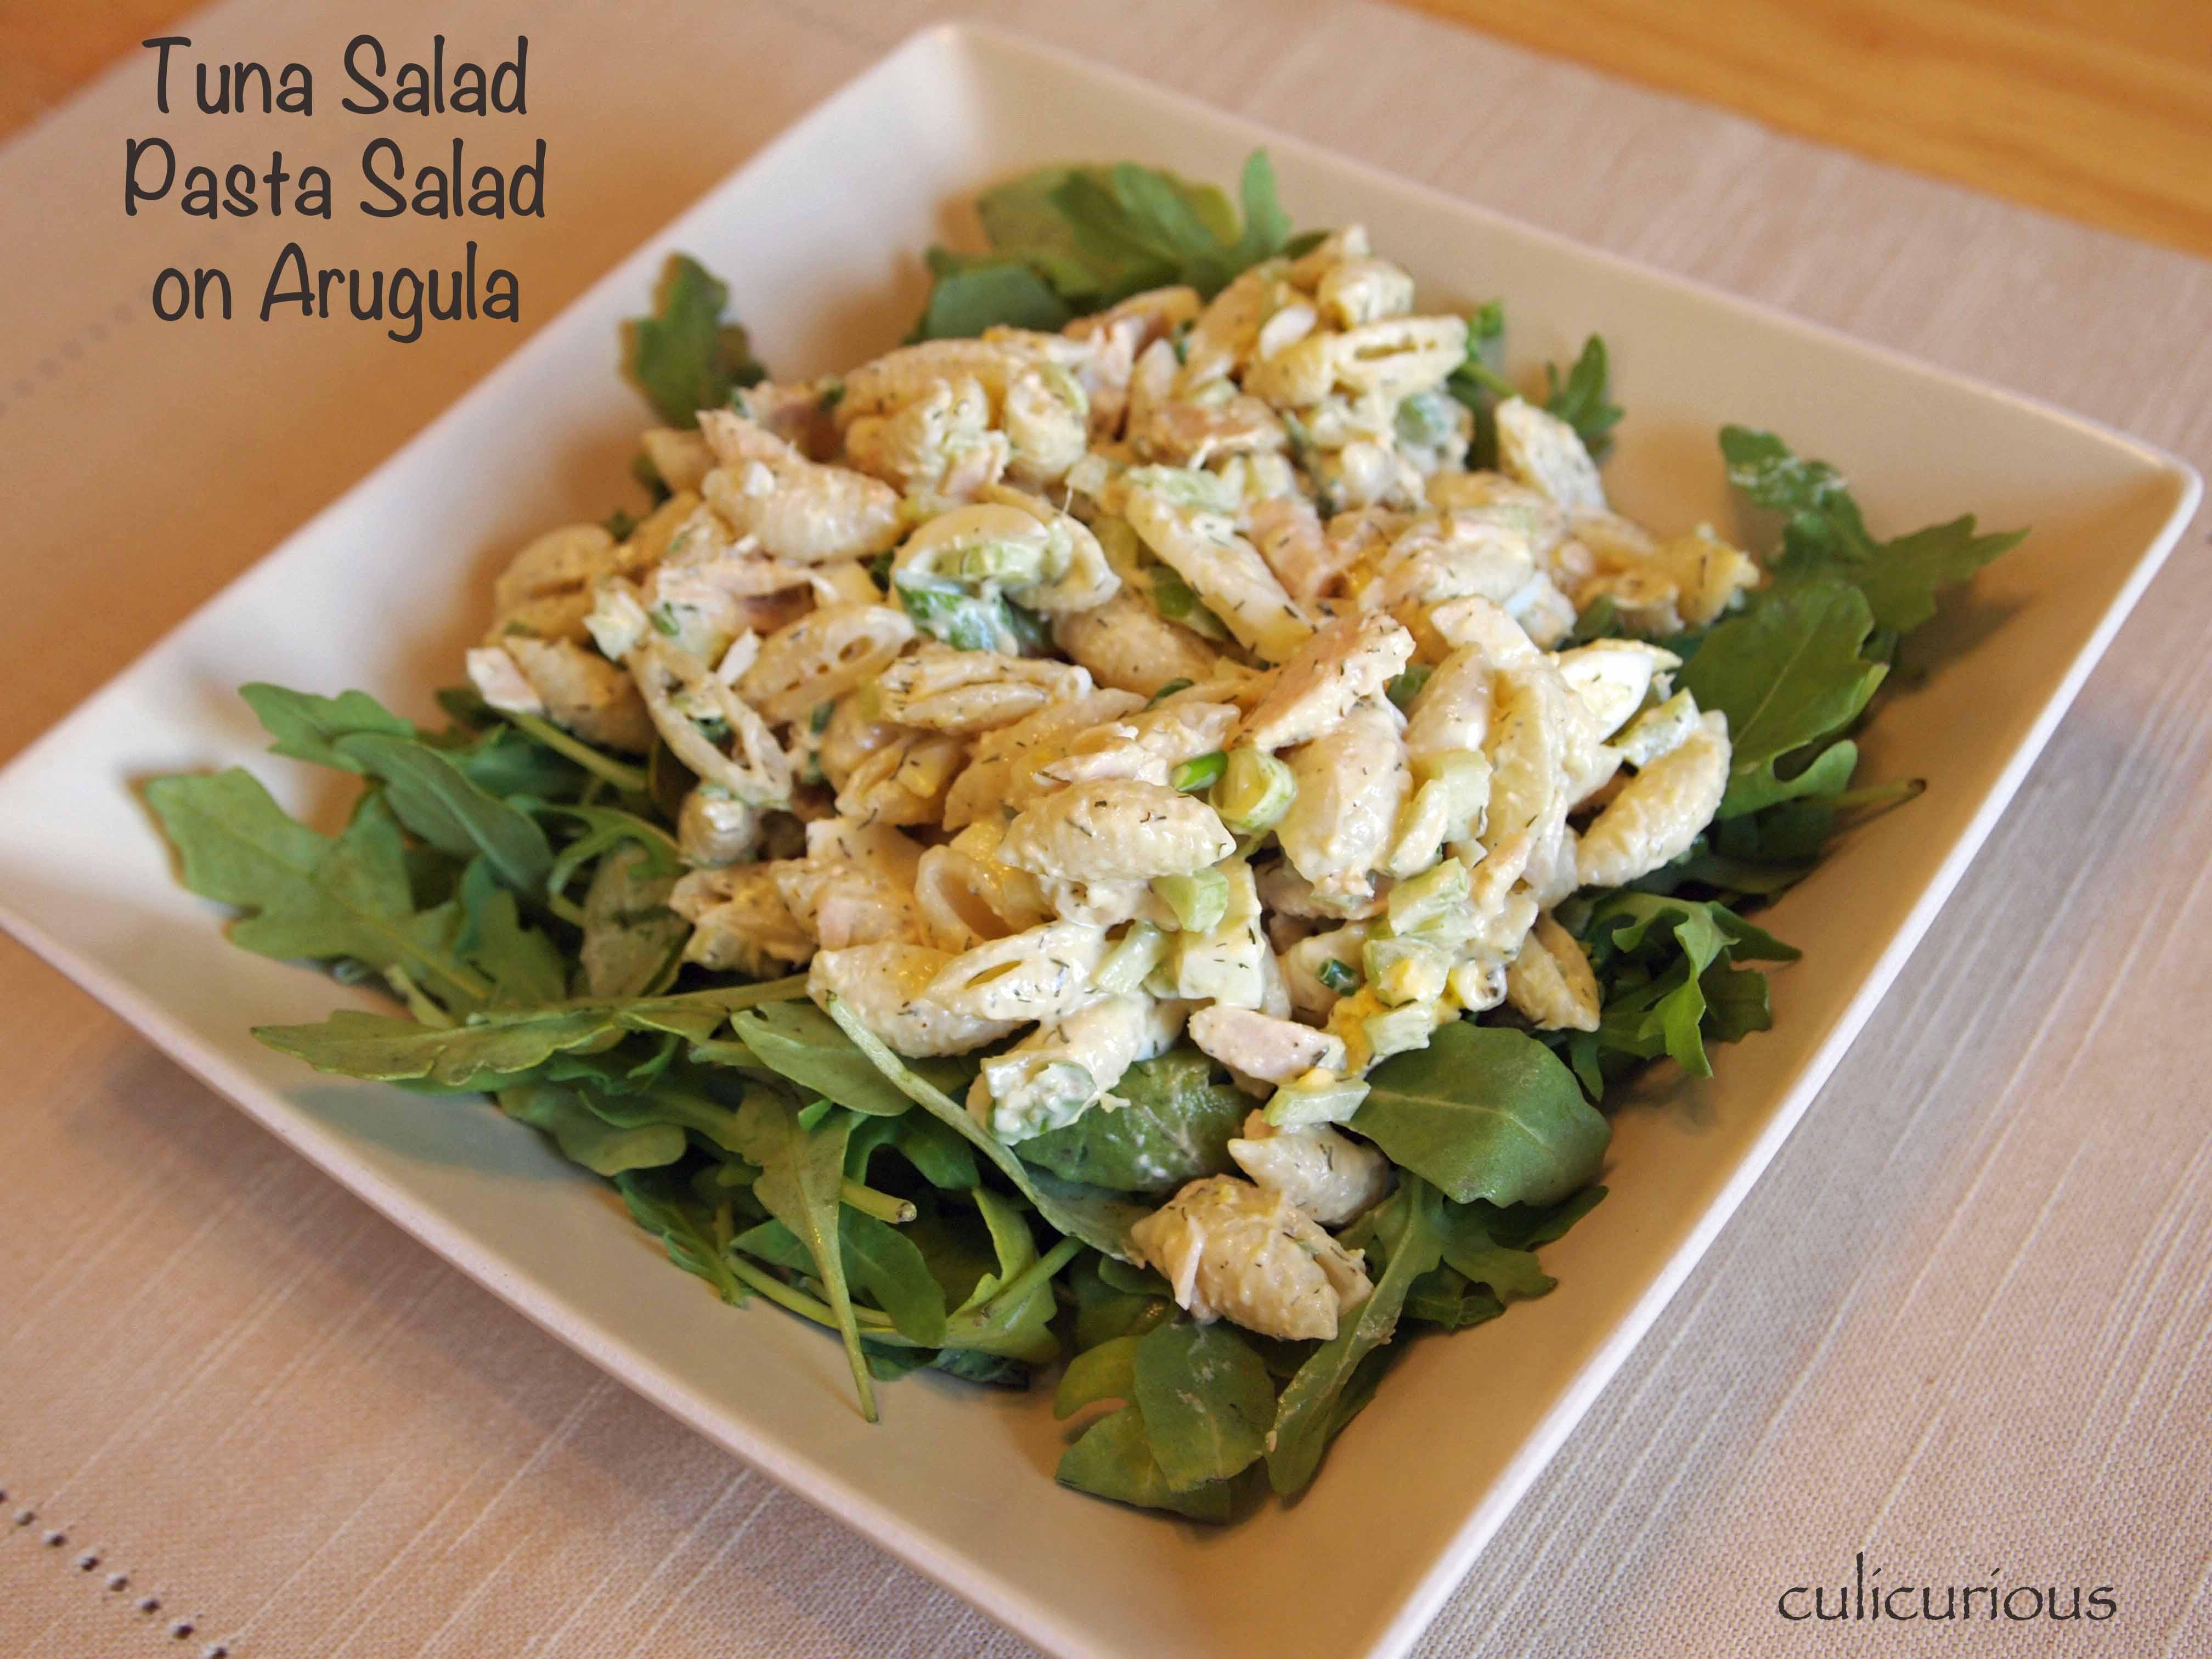 Tuna Pasta Salad Recipe  Tuna Salad Pasta Salad Recipe culicurious